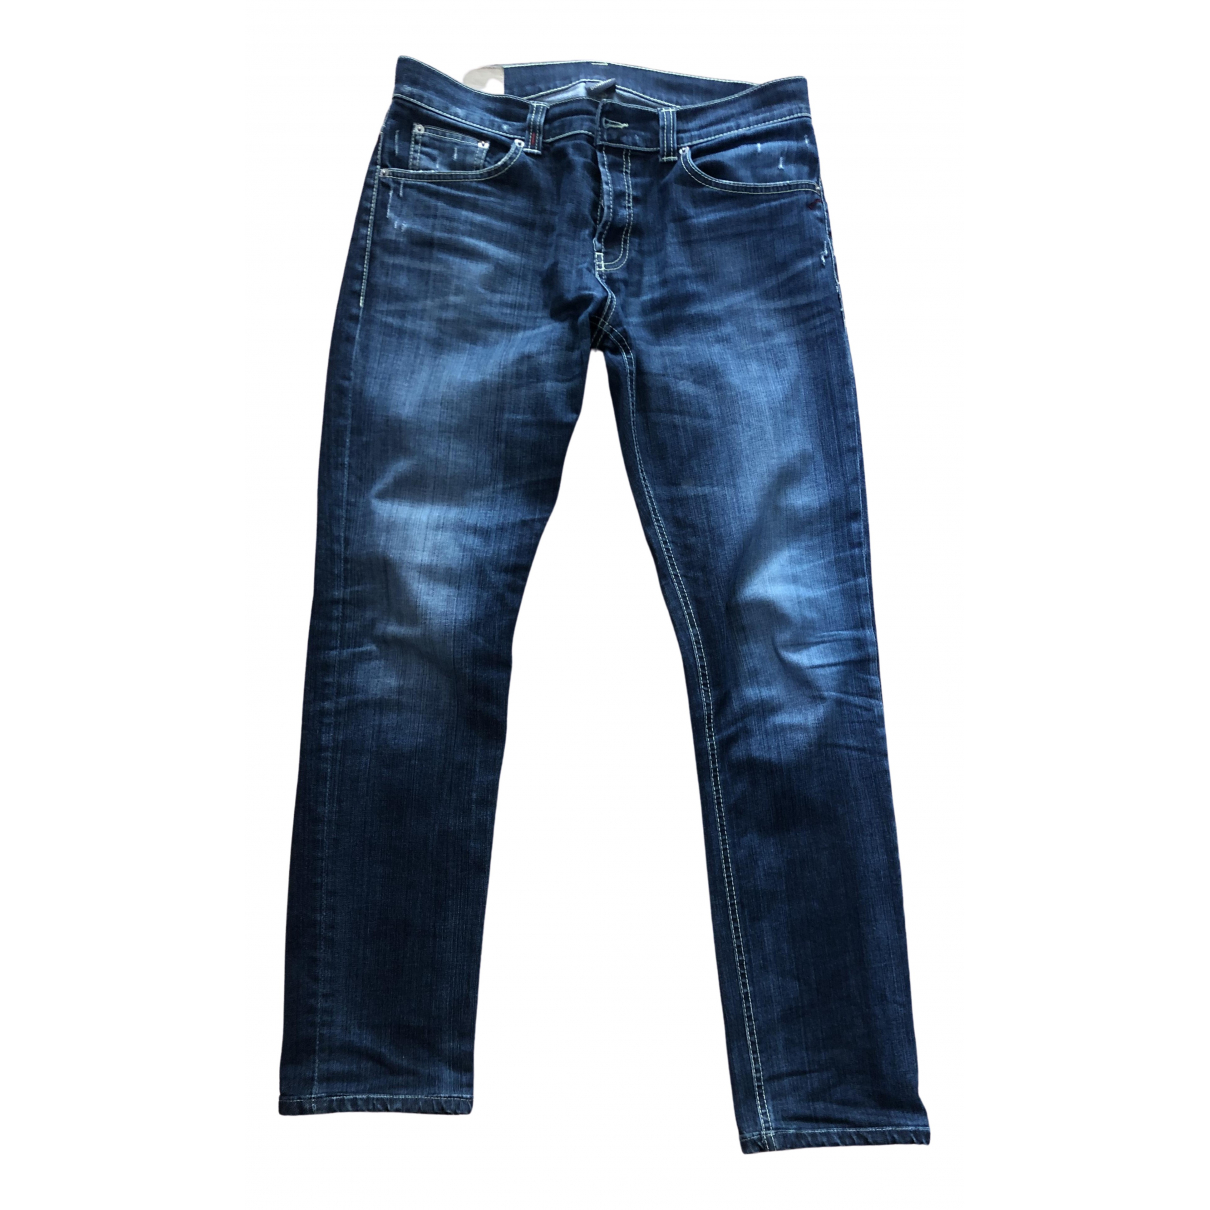 Dondup \N Blue Cotton - elasthane Jeans for Men 34 US